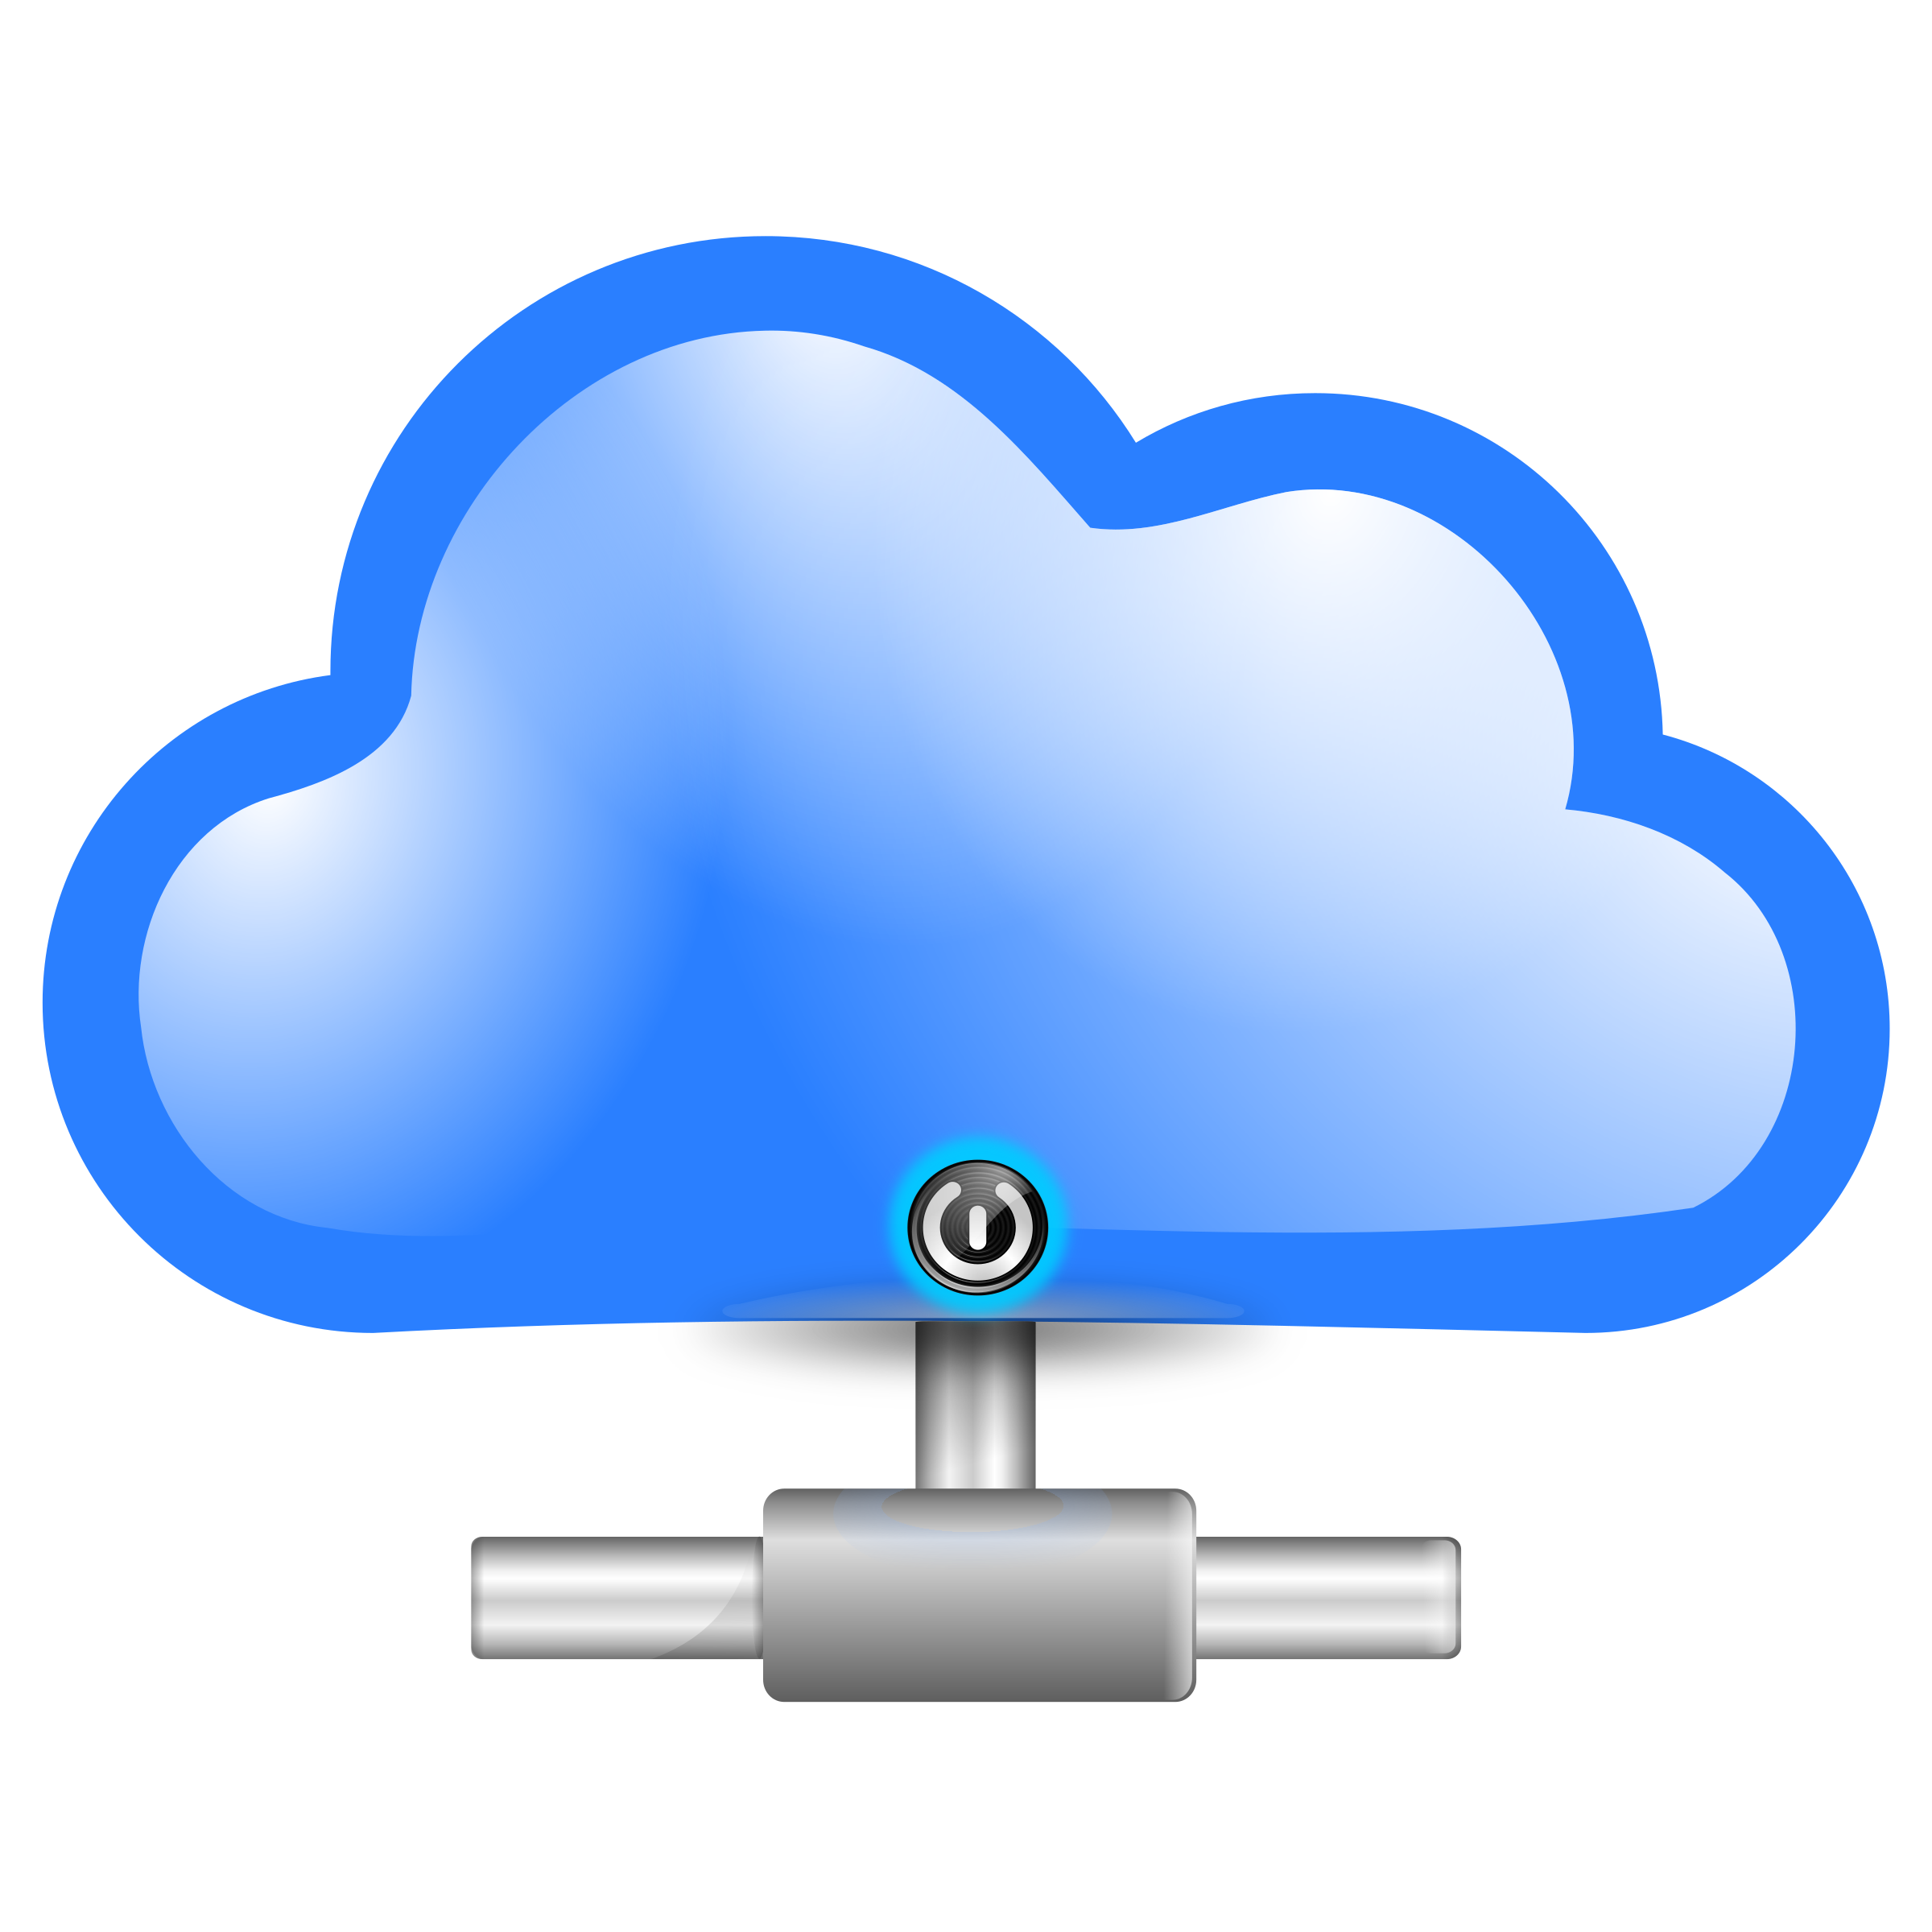 Clipart computer computing. Cloud big image png